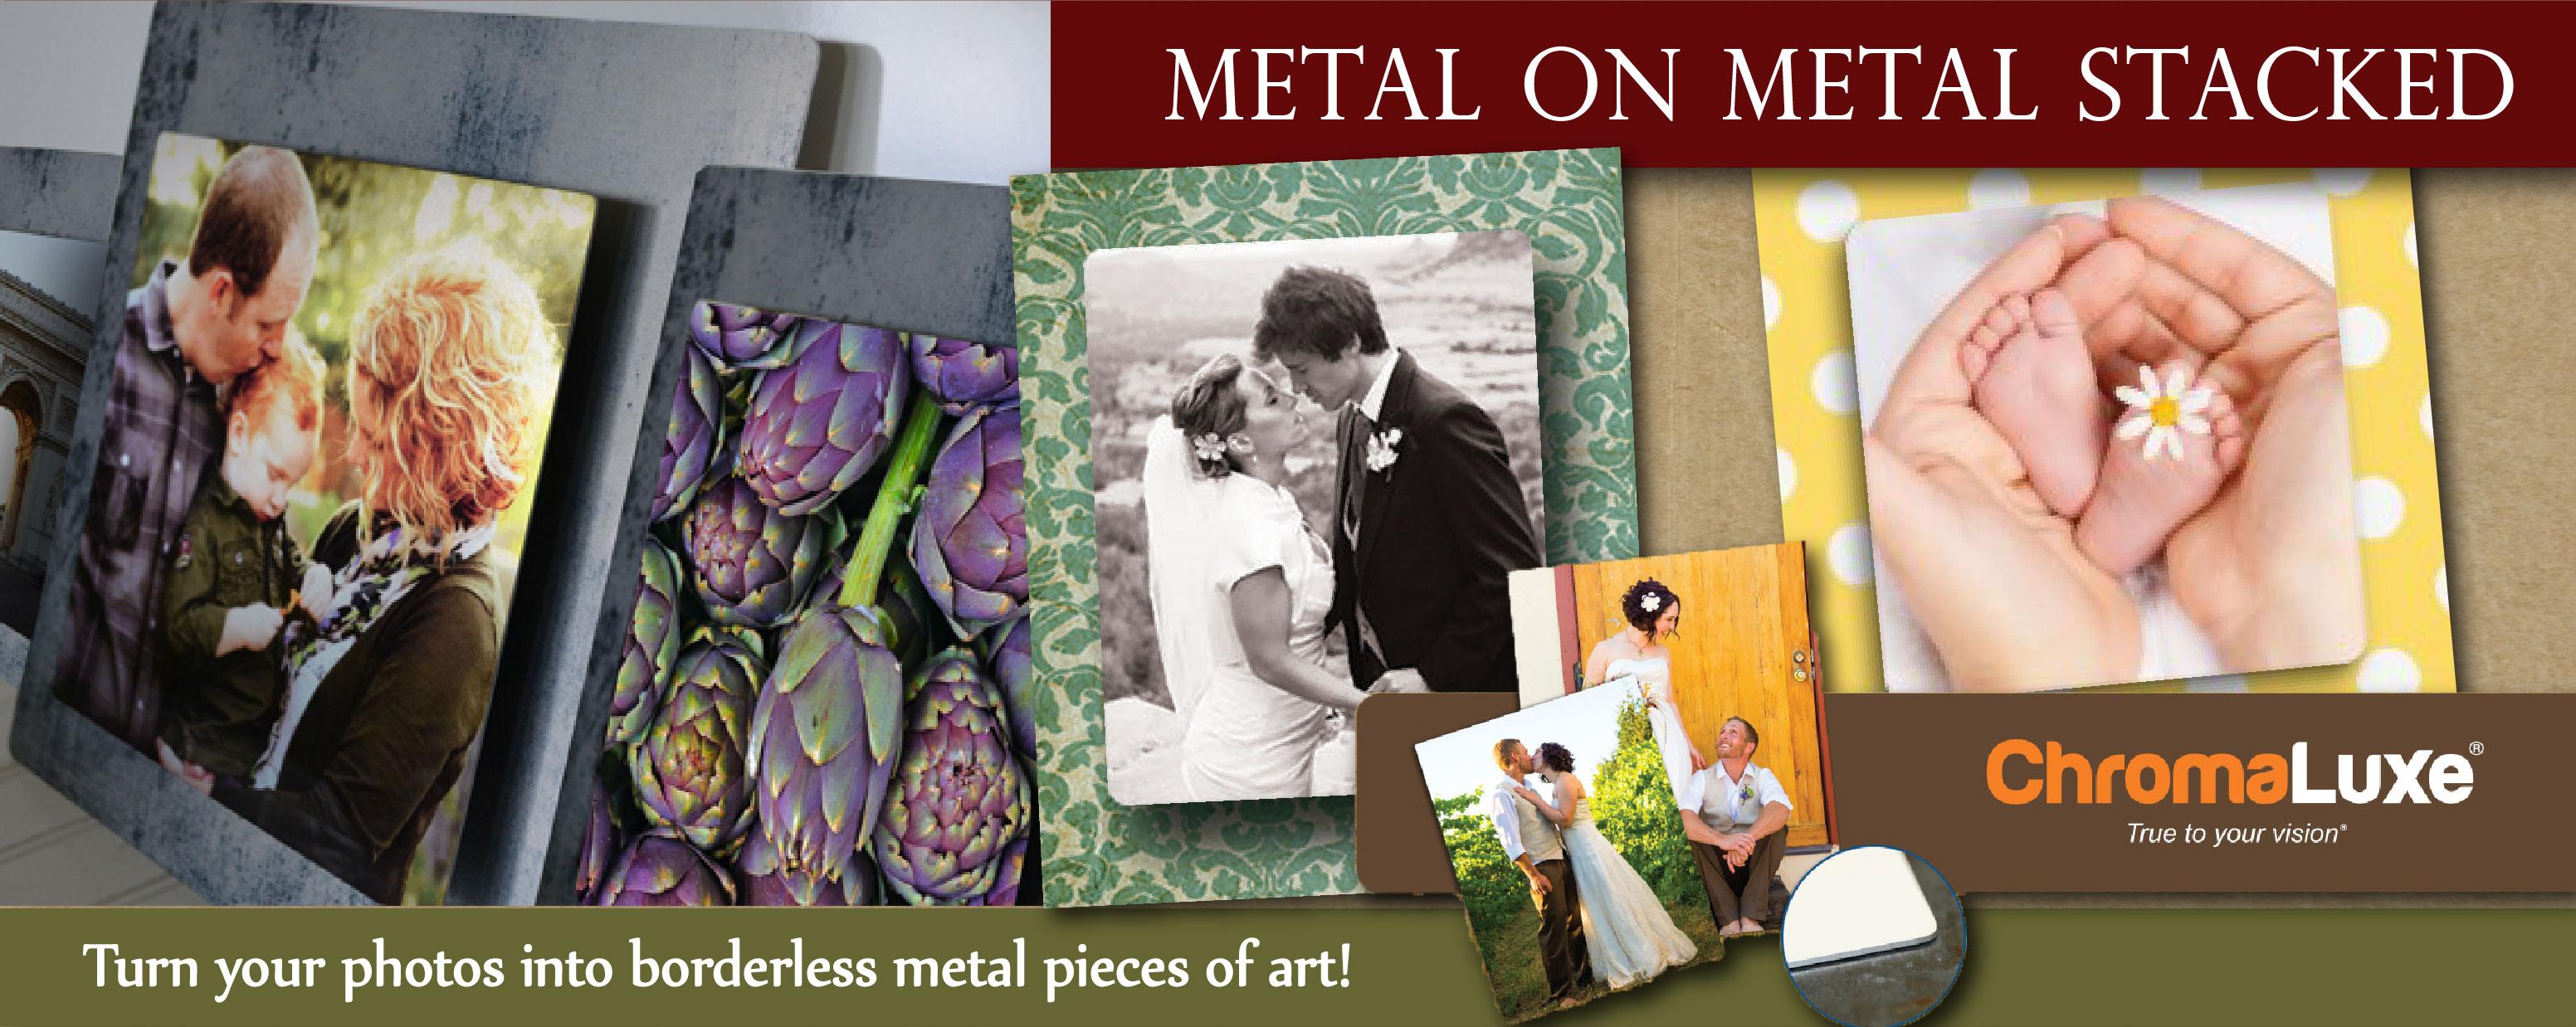 metal-on-metal-stached-banner-01.jpg